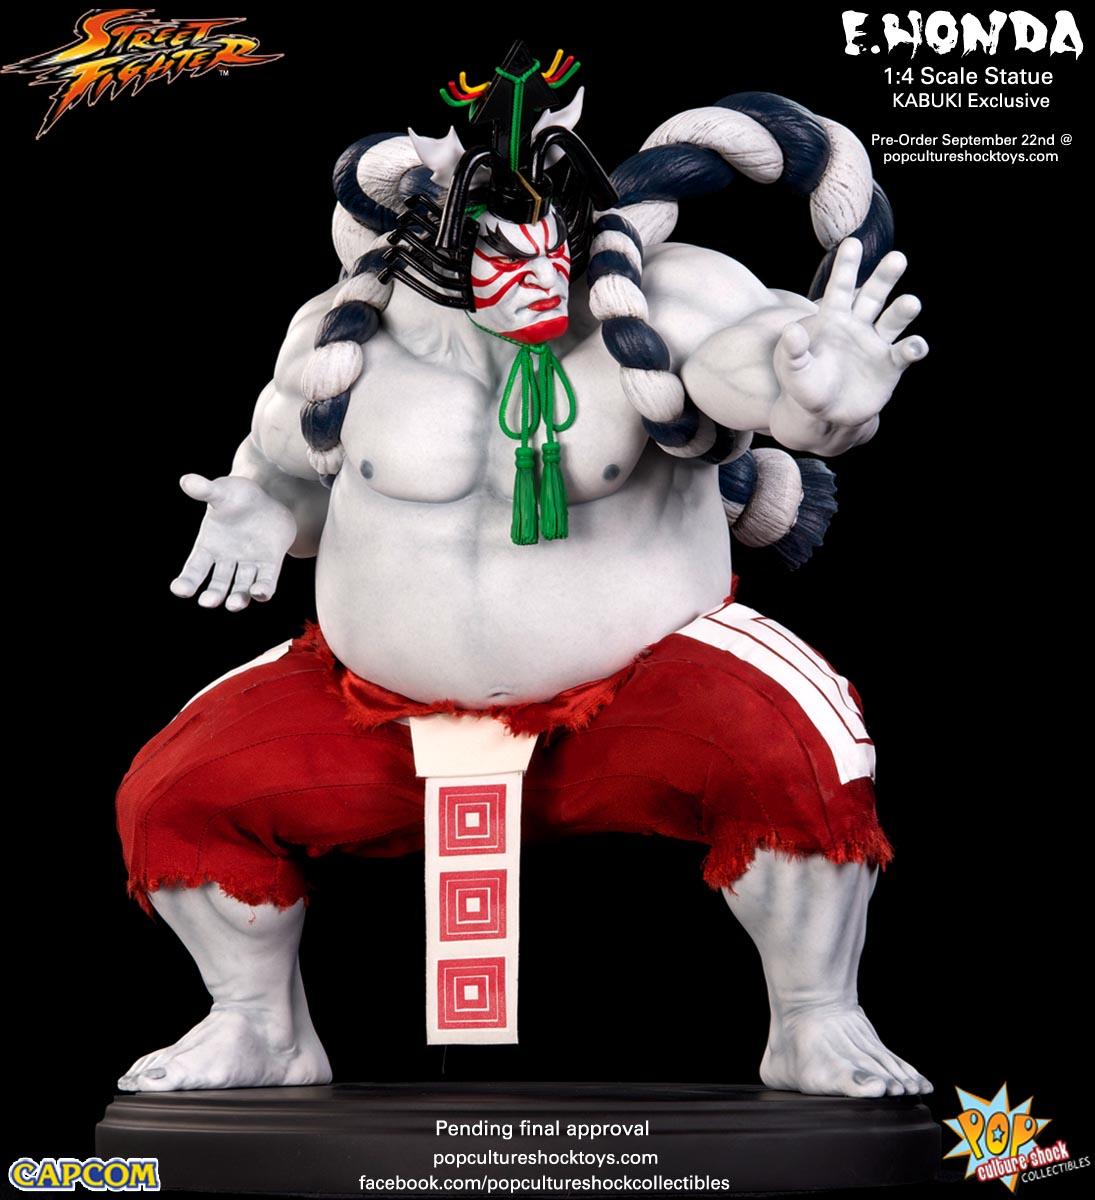 [Pop Culture Shock] Street Fighter: E. Honda 1/4 Statue - Página 3 Street-Fighter-E.-Honda-Kabuki-Statue-010